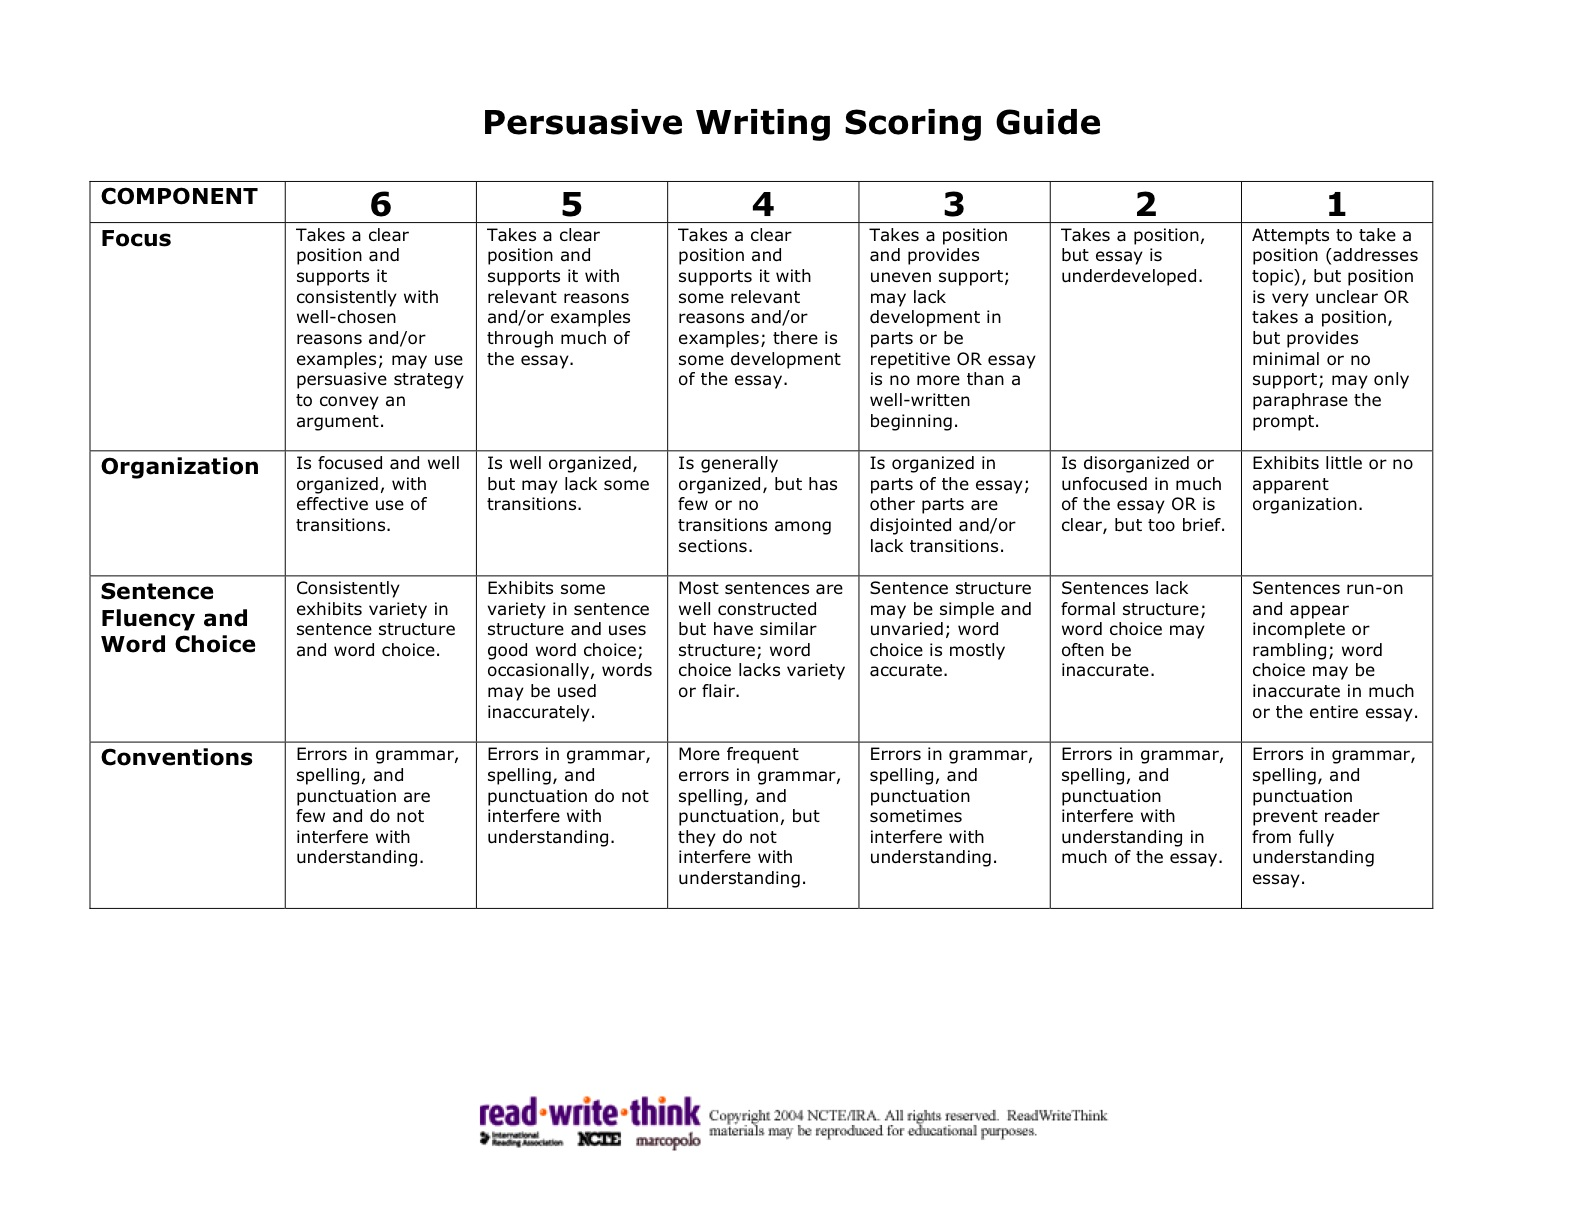 018 Rubrics In Essay Writing Persuasivewritingscoringguide Formidable Holistic For Pdf Rubric Middle School Full